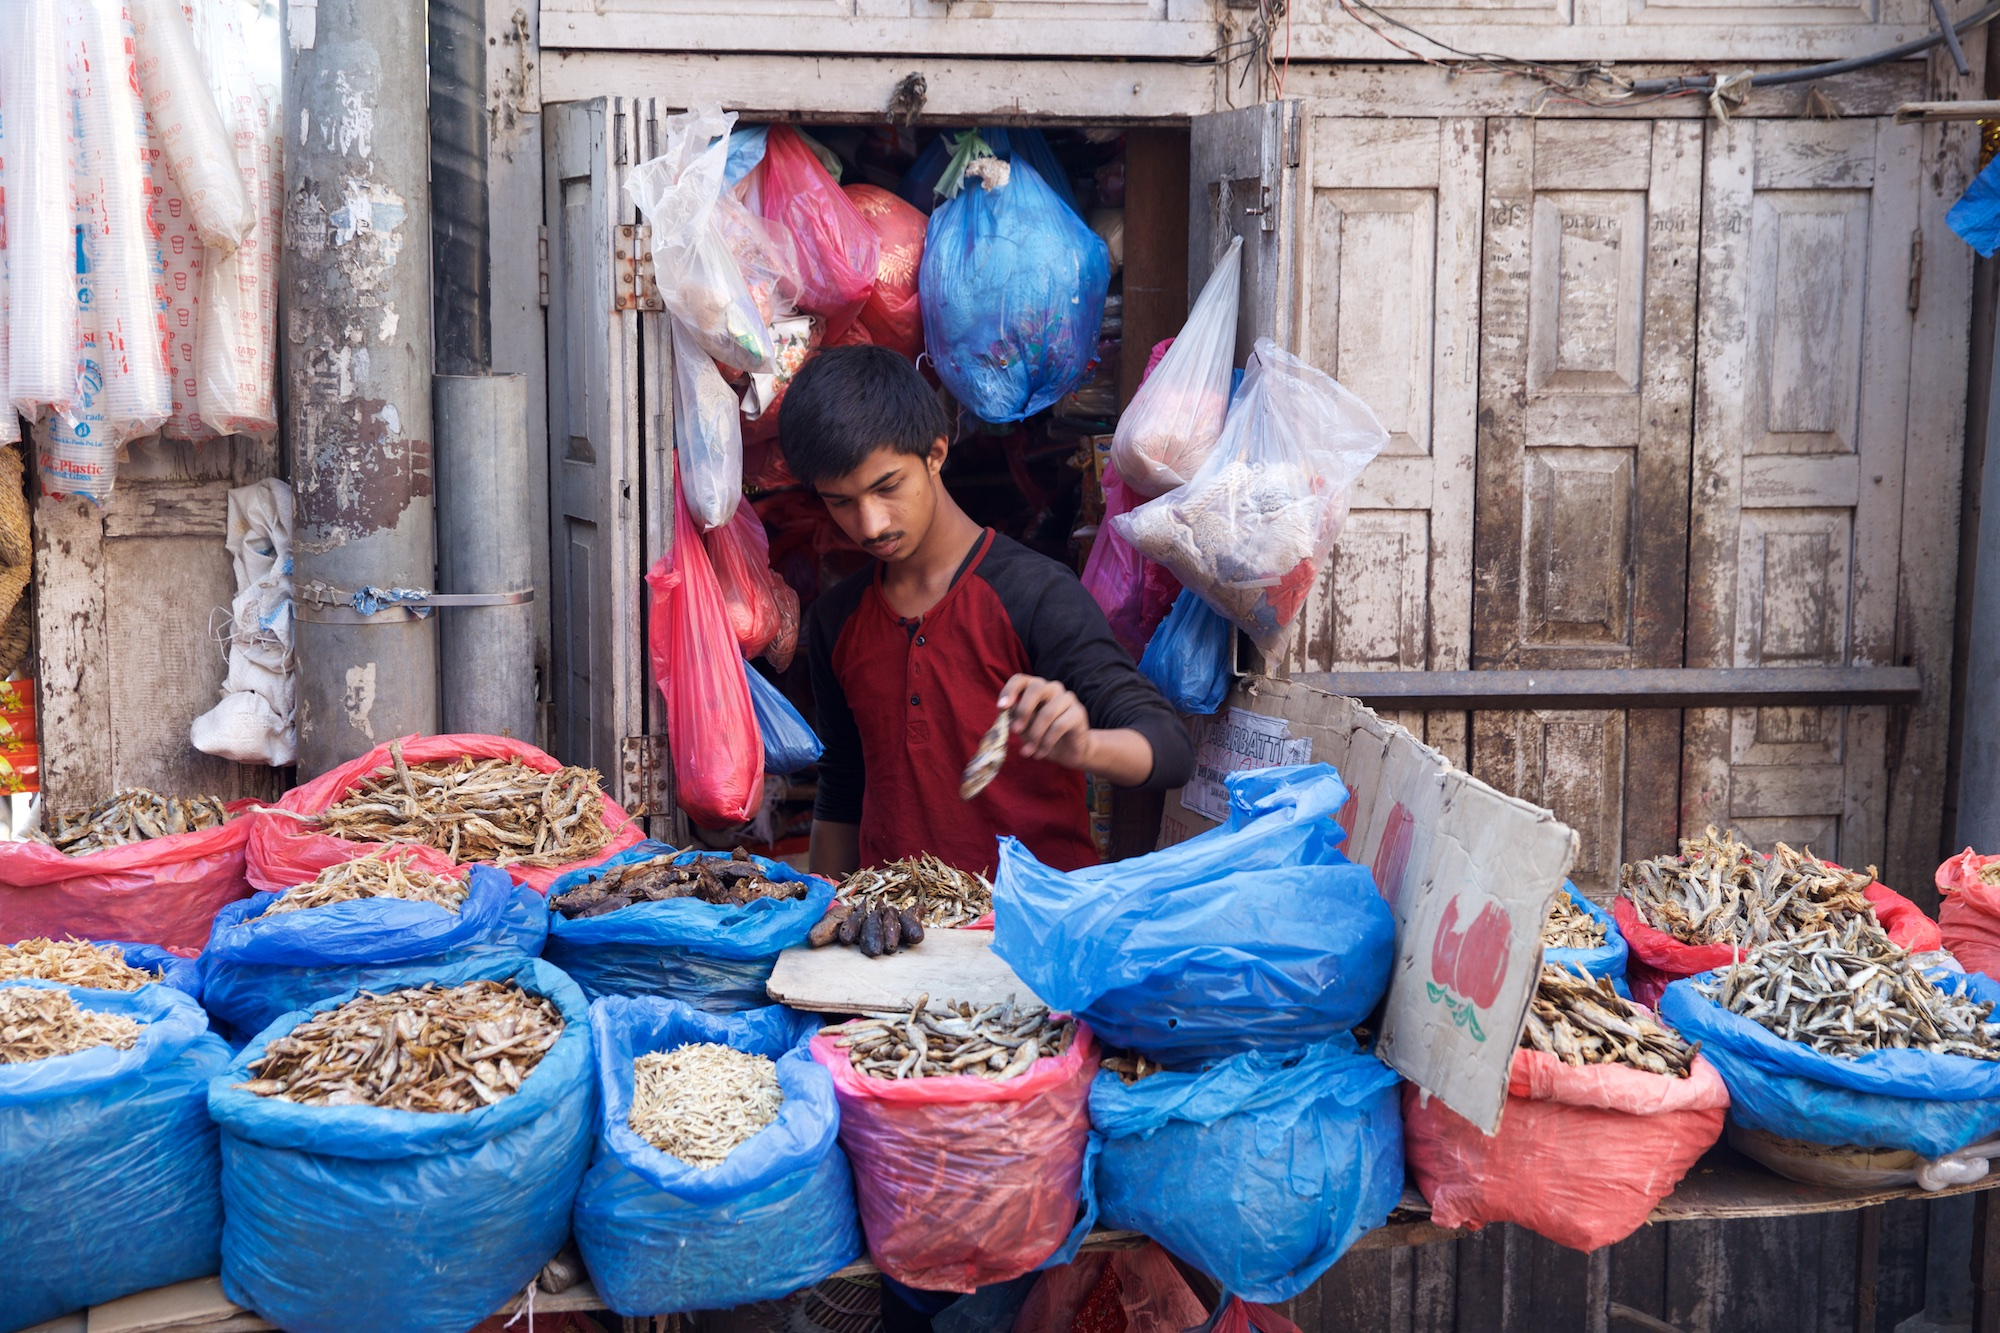 Nepal-Streets-2016- C26O7602.jpg